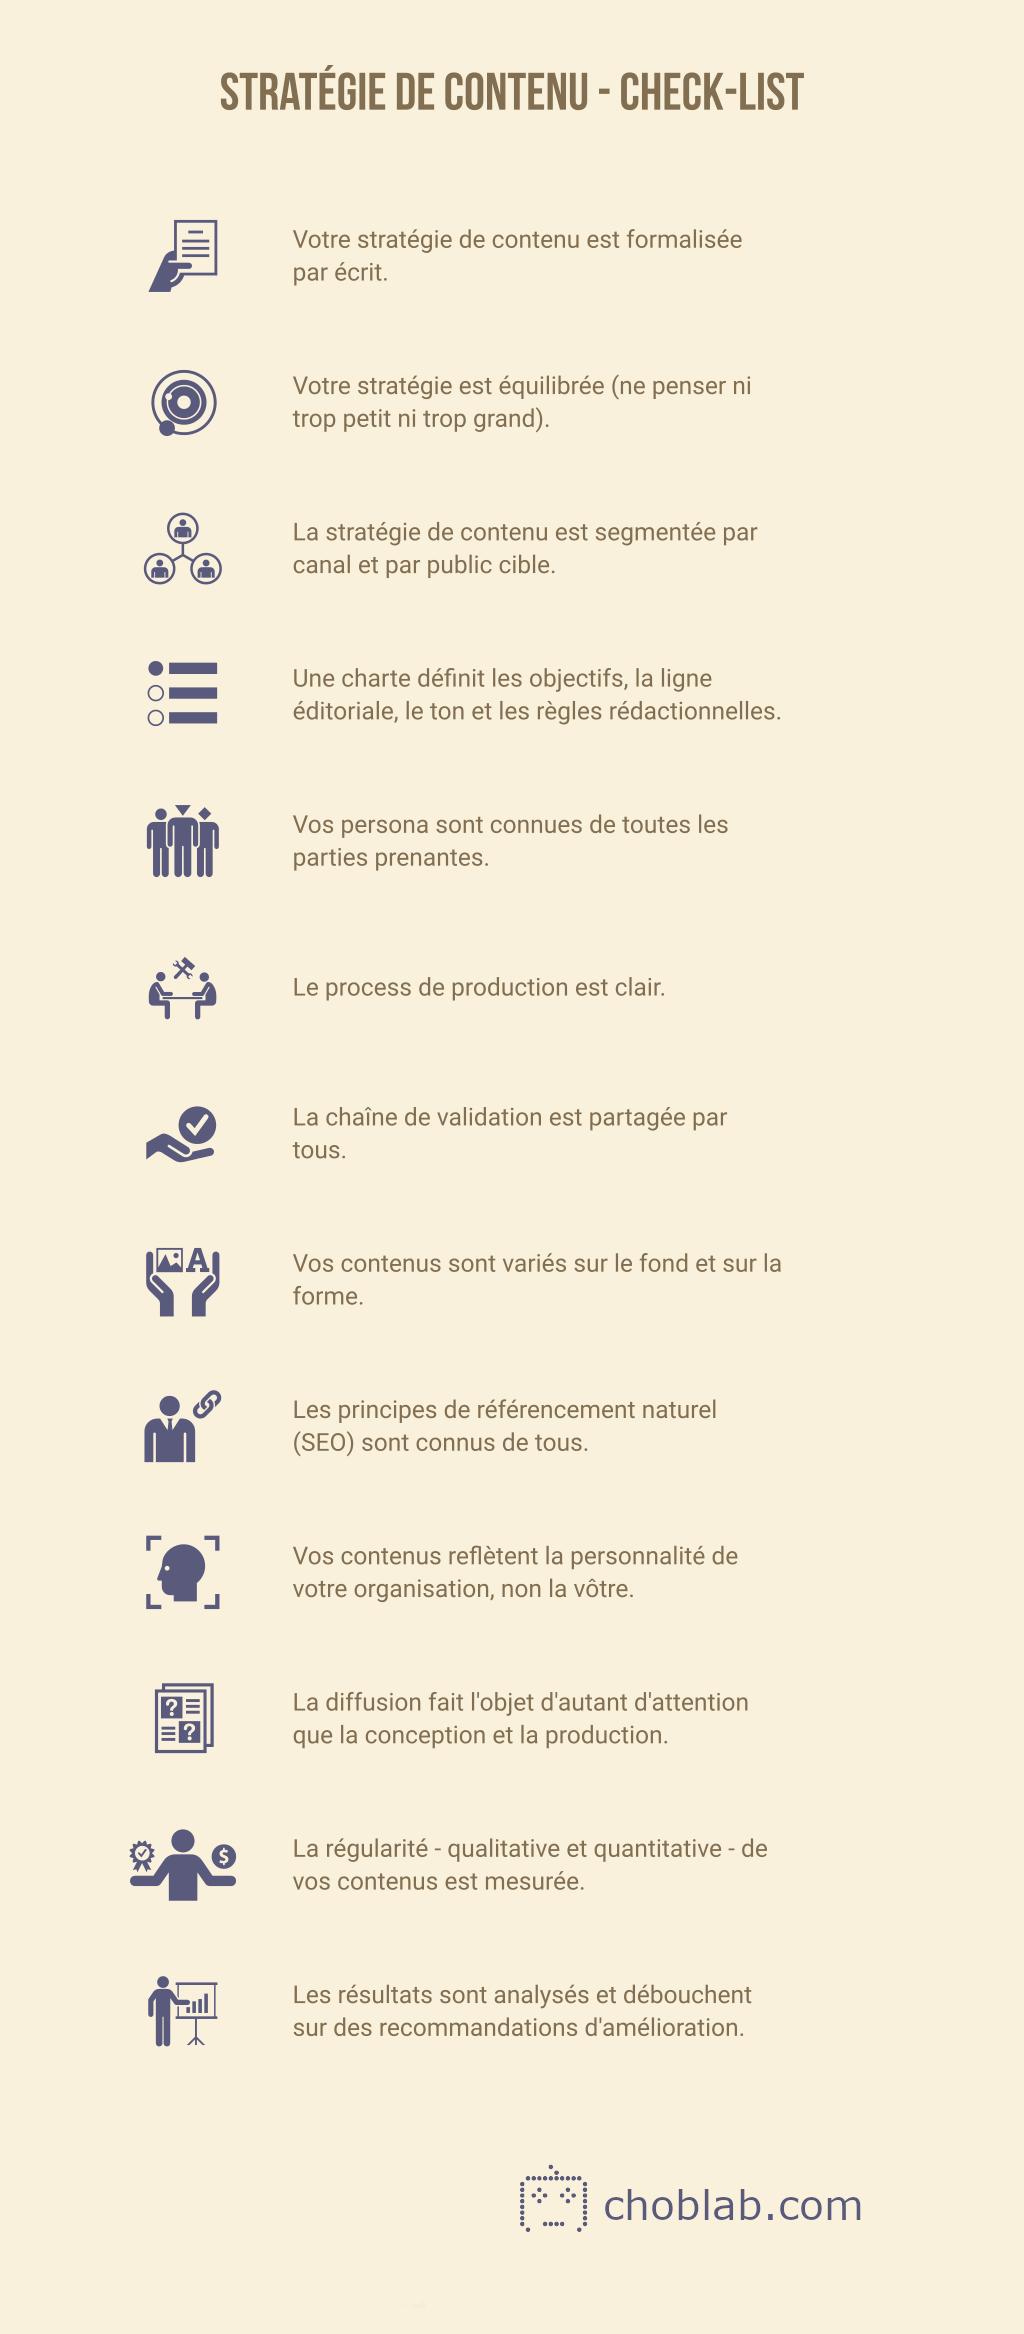 Stratégie de contenu - check-list #infographie